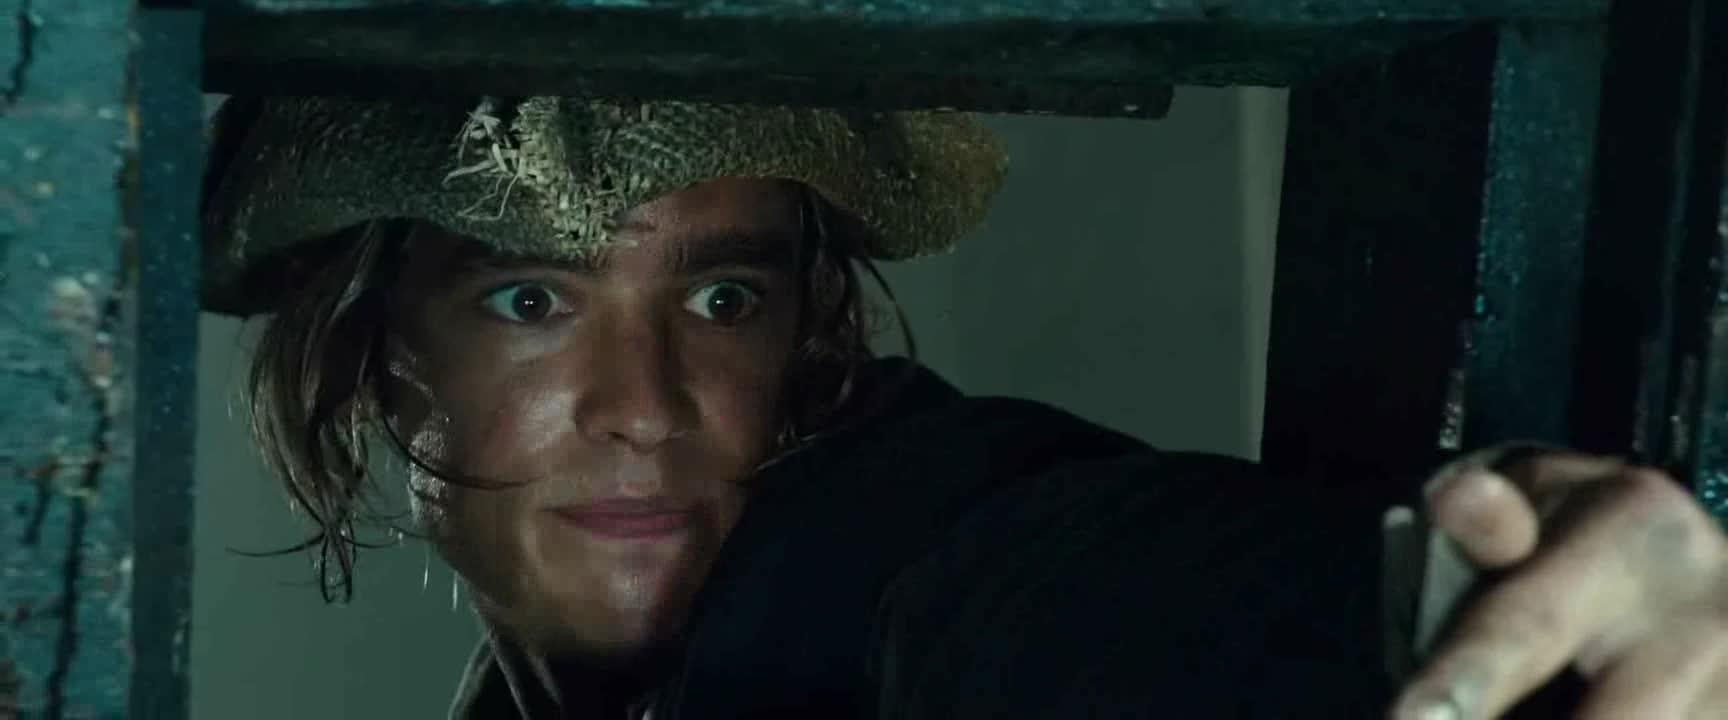 Pirati z Karibiku   Salazarova pomsta  2017  cz dabing